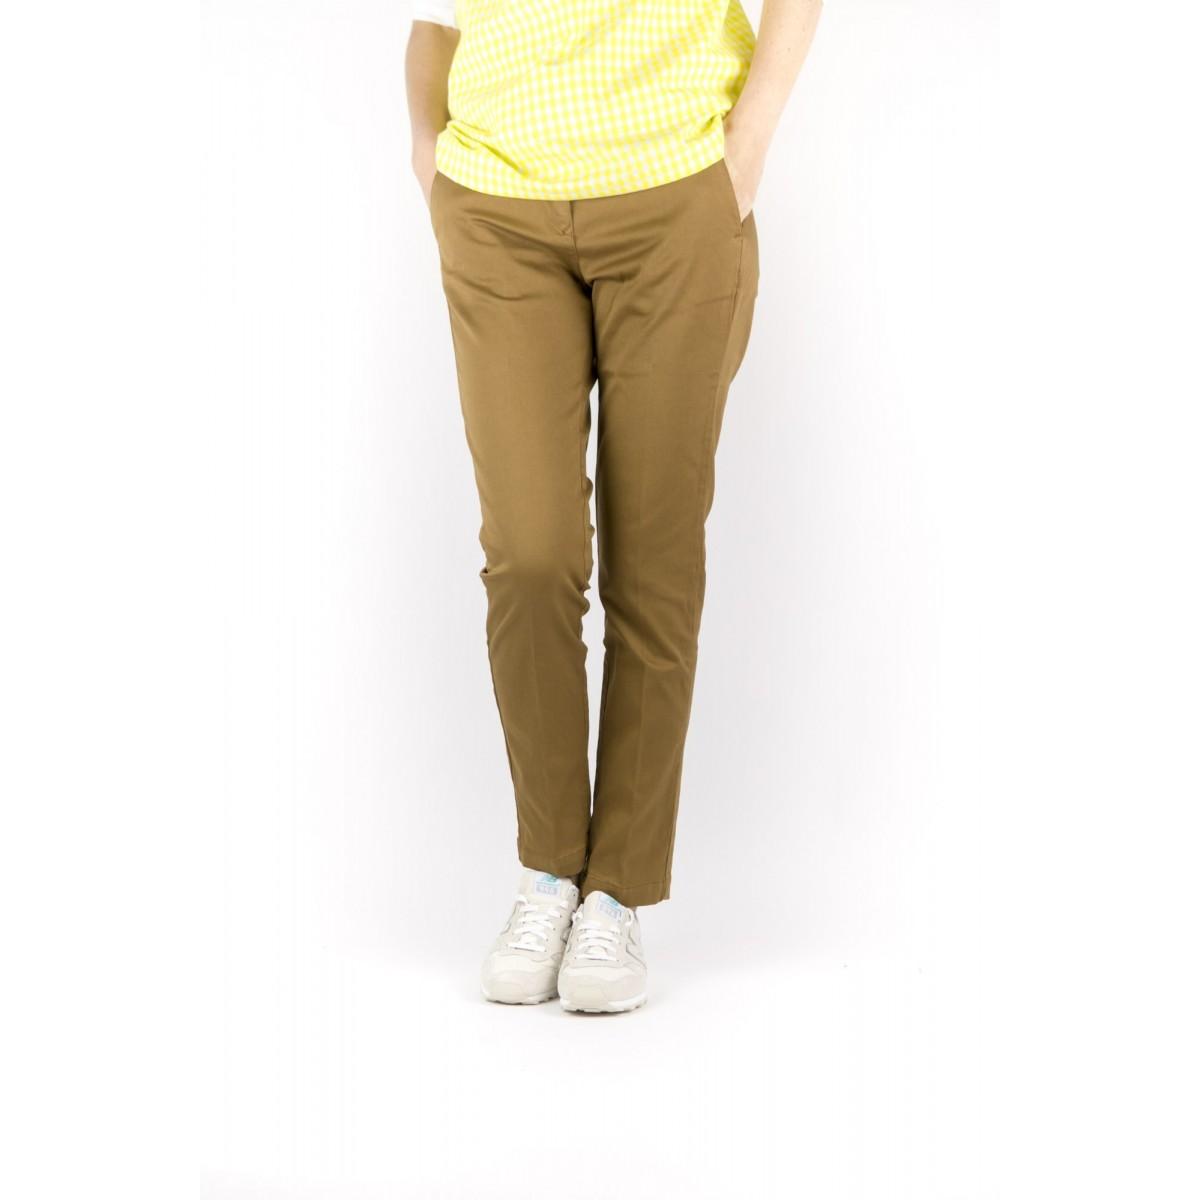 Pantalone donna Department five - Emy t1001 gabardina strech 048 - tabacco